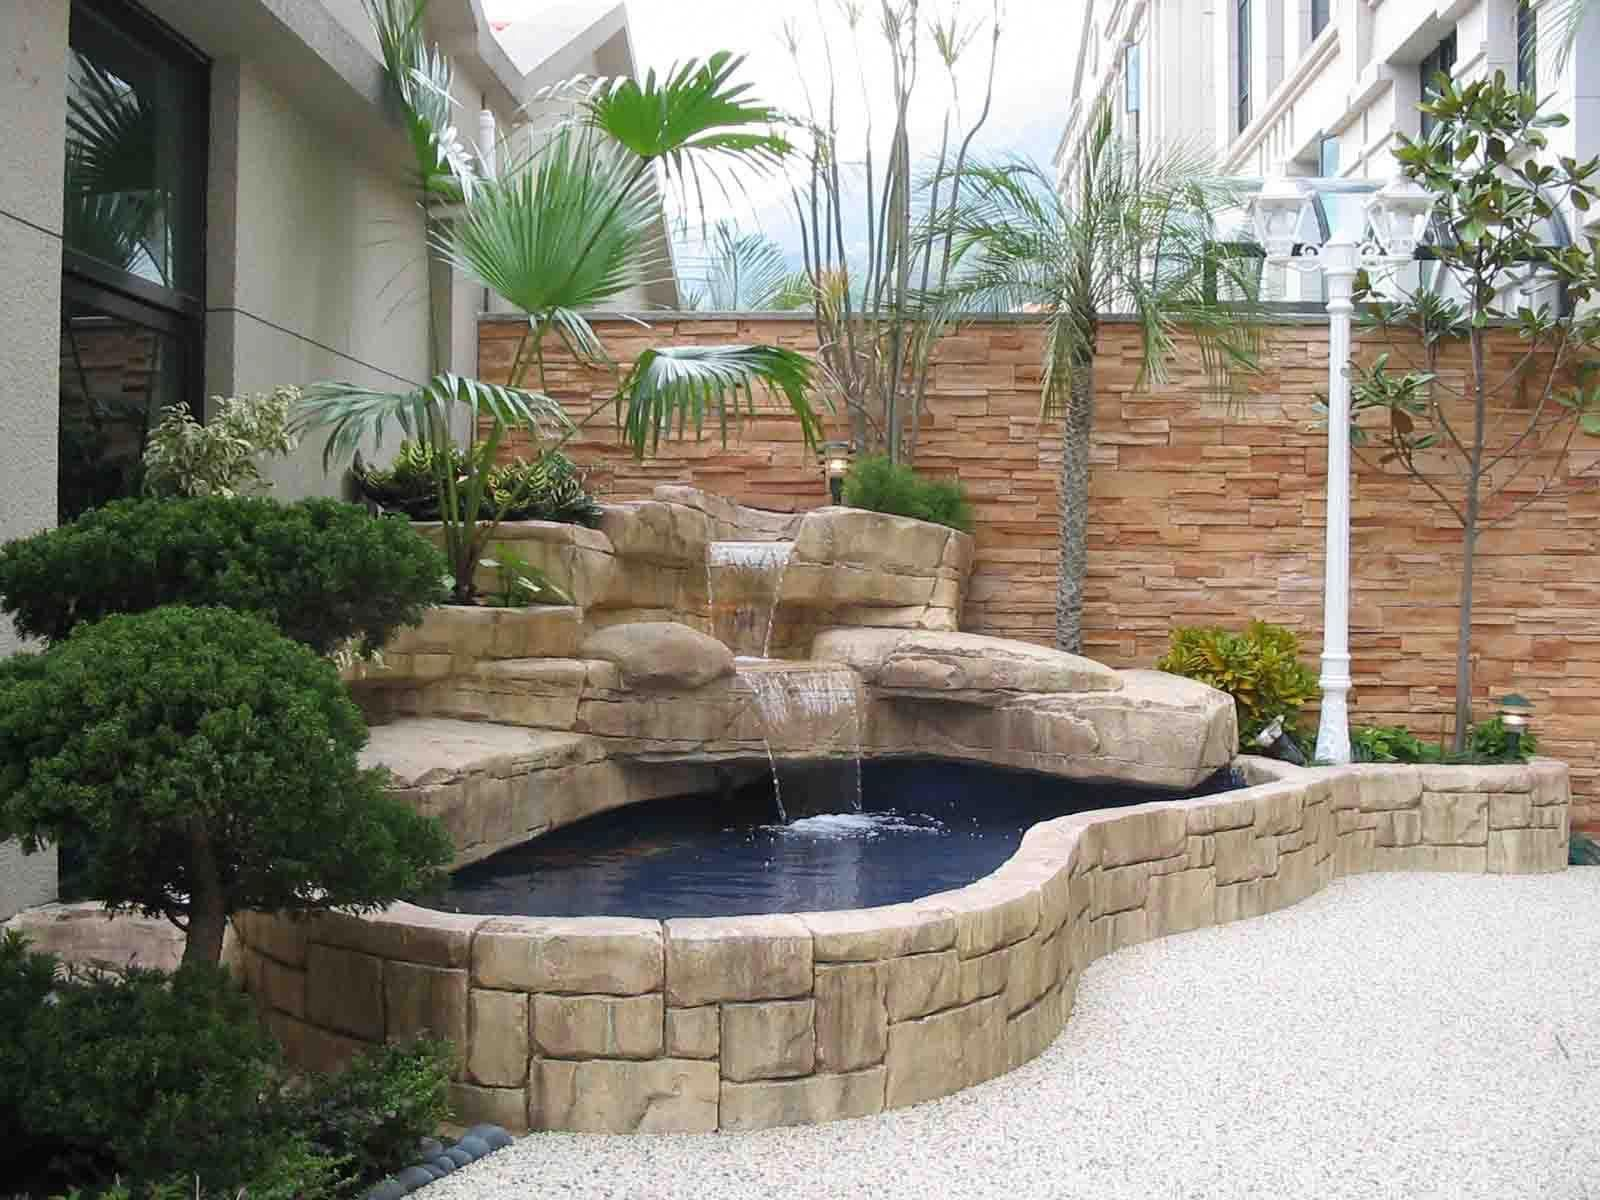 Backyard Fish Pond Ideas With Small Garden Koifishponds Garden Pond Design Pond Design Ponds Backyard